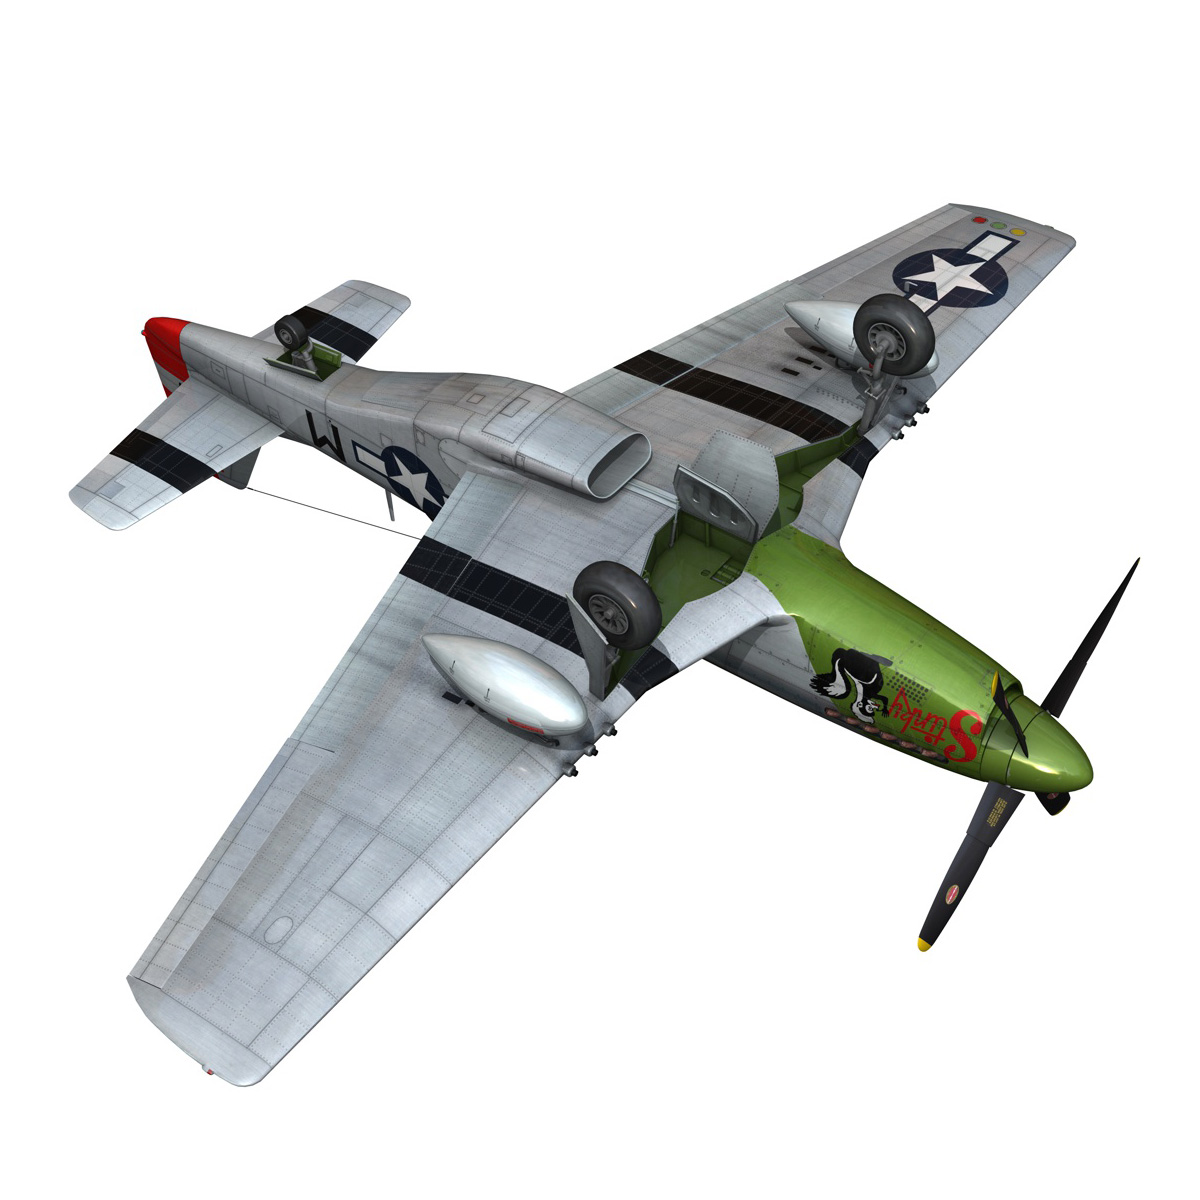 north american p-51d mustang – stinky 3d model fbx c4d lwo obj 269612